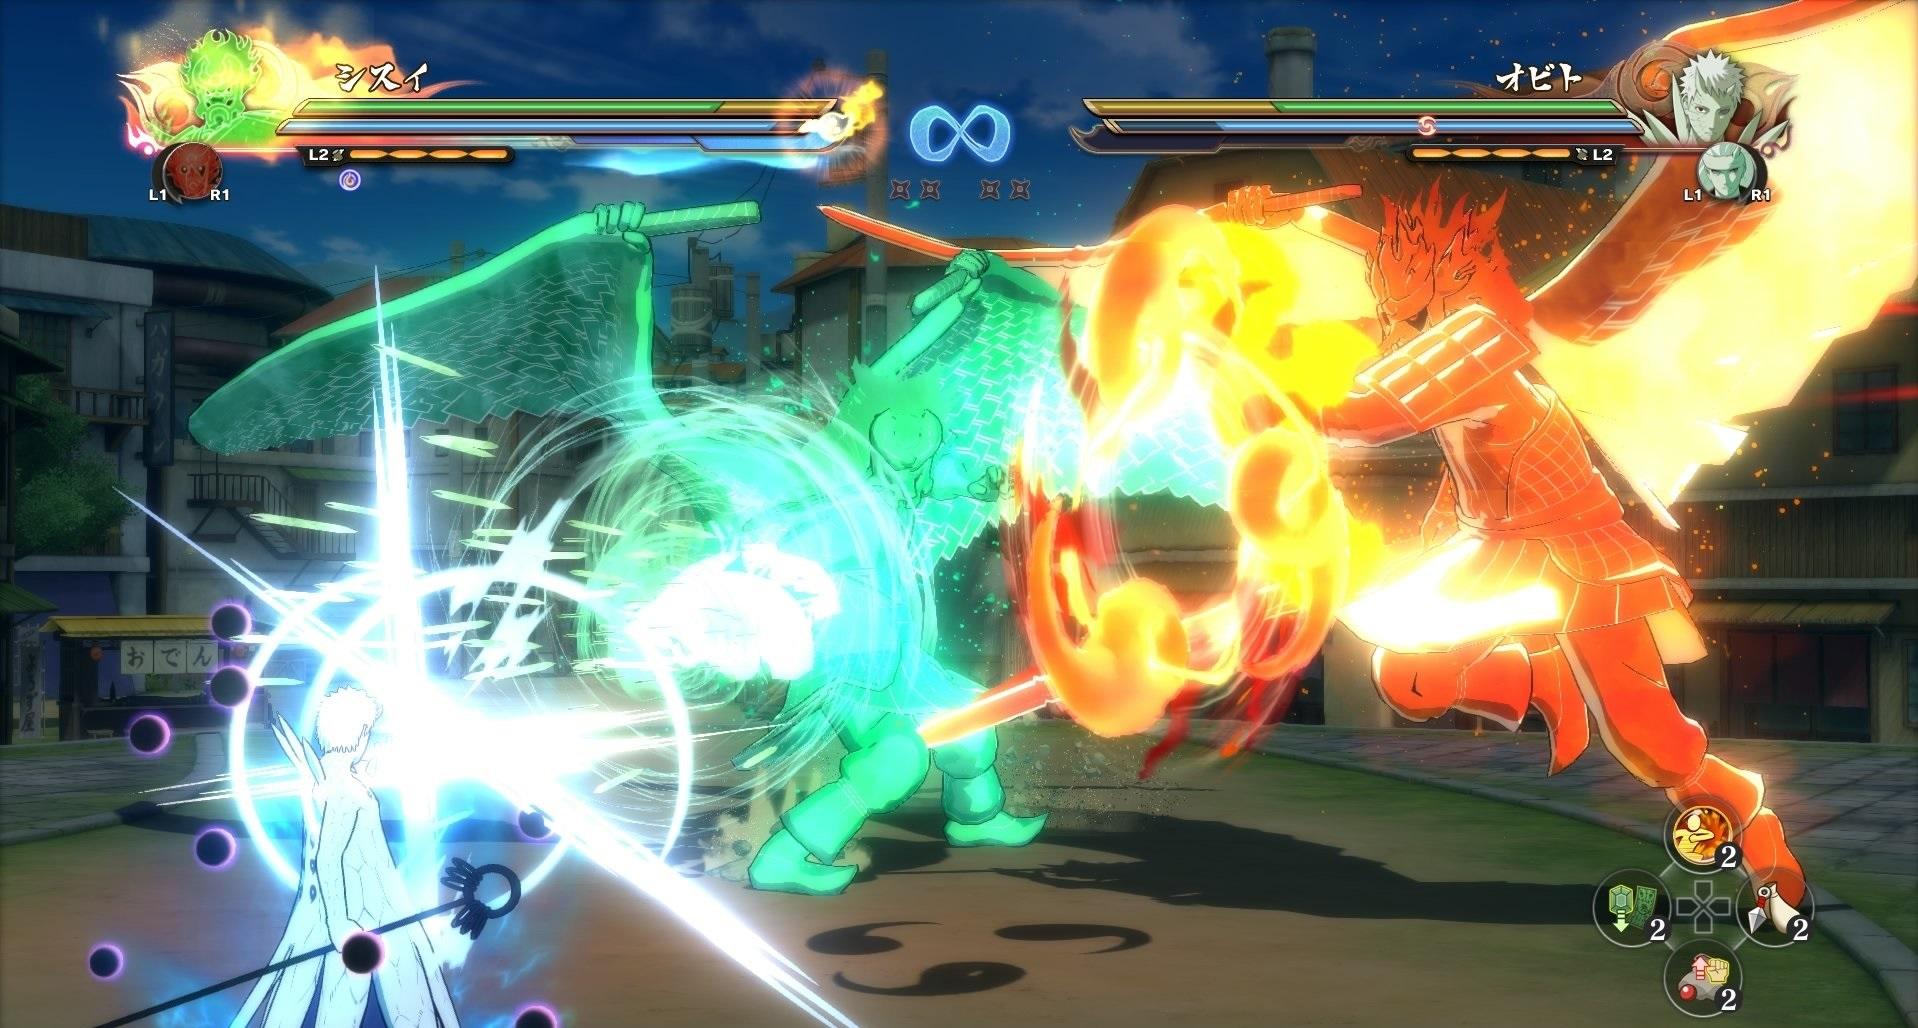 Naruto-Storm-4-5 Naruto Storm 4:Mükemmel Susanoo Shisui ve Itachi Ekran Görüntüleri